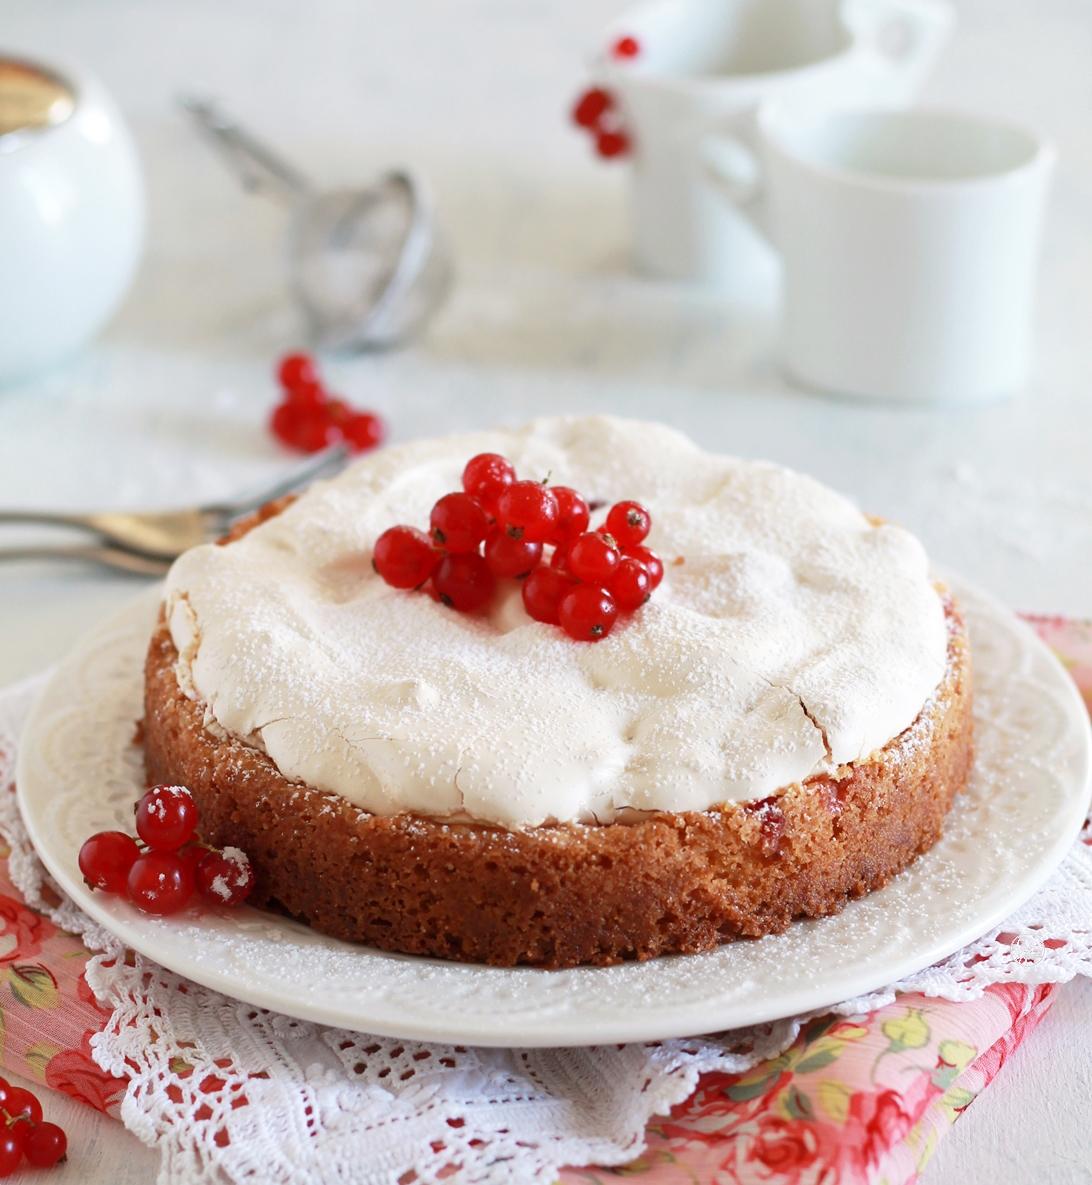 Torta meringata al ribes senza glutine - La Cassata Celiaca